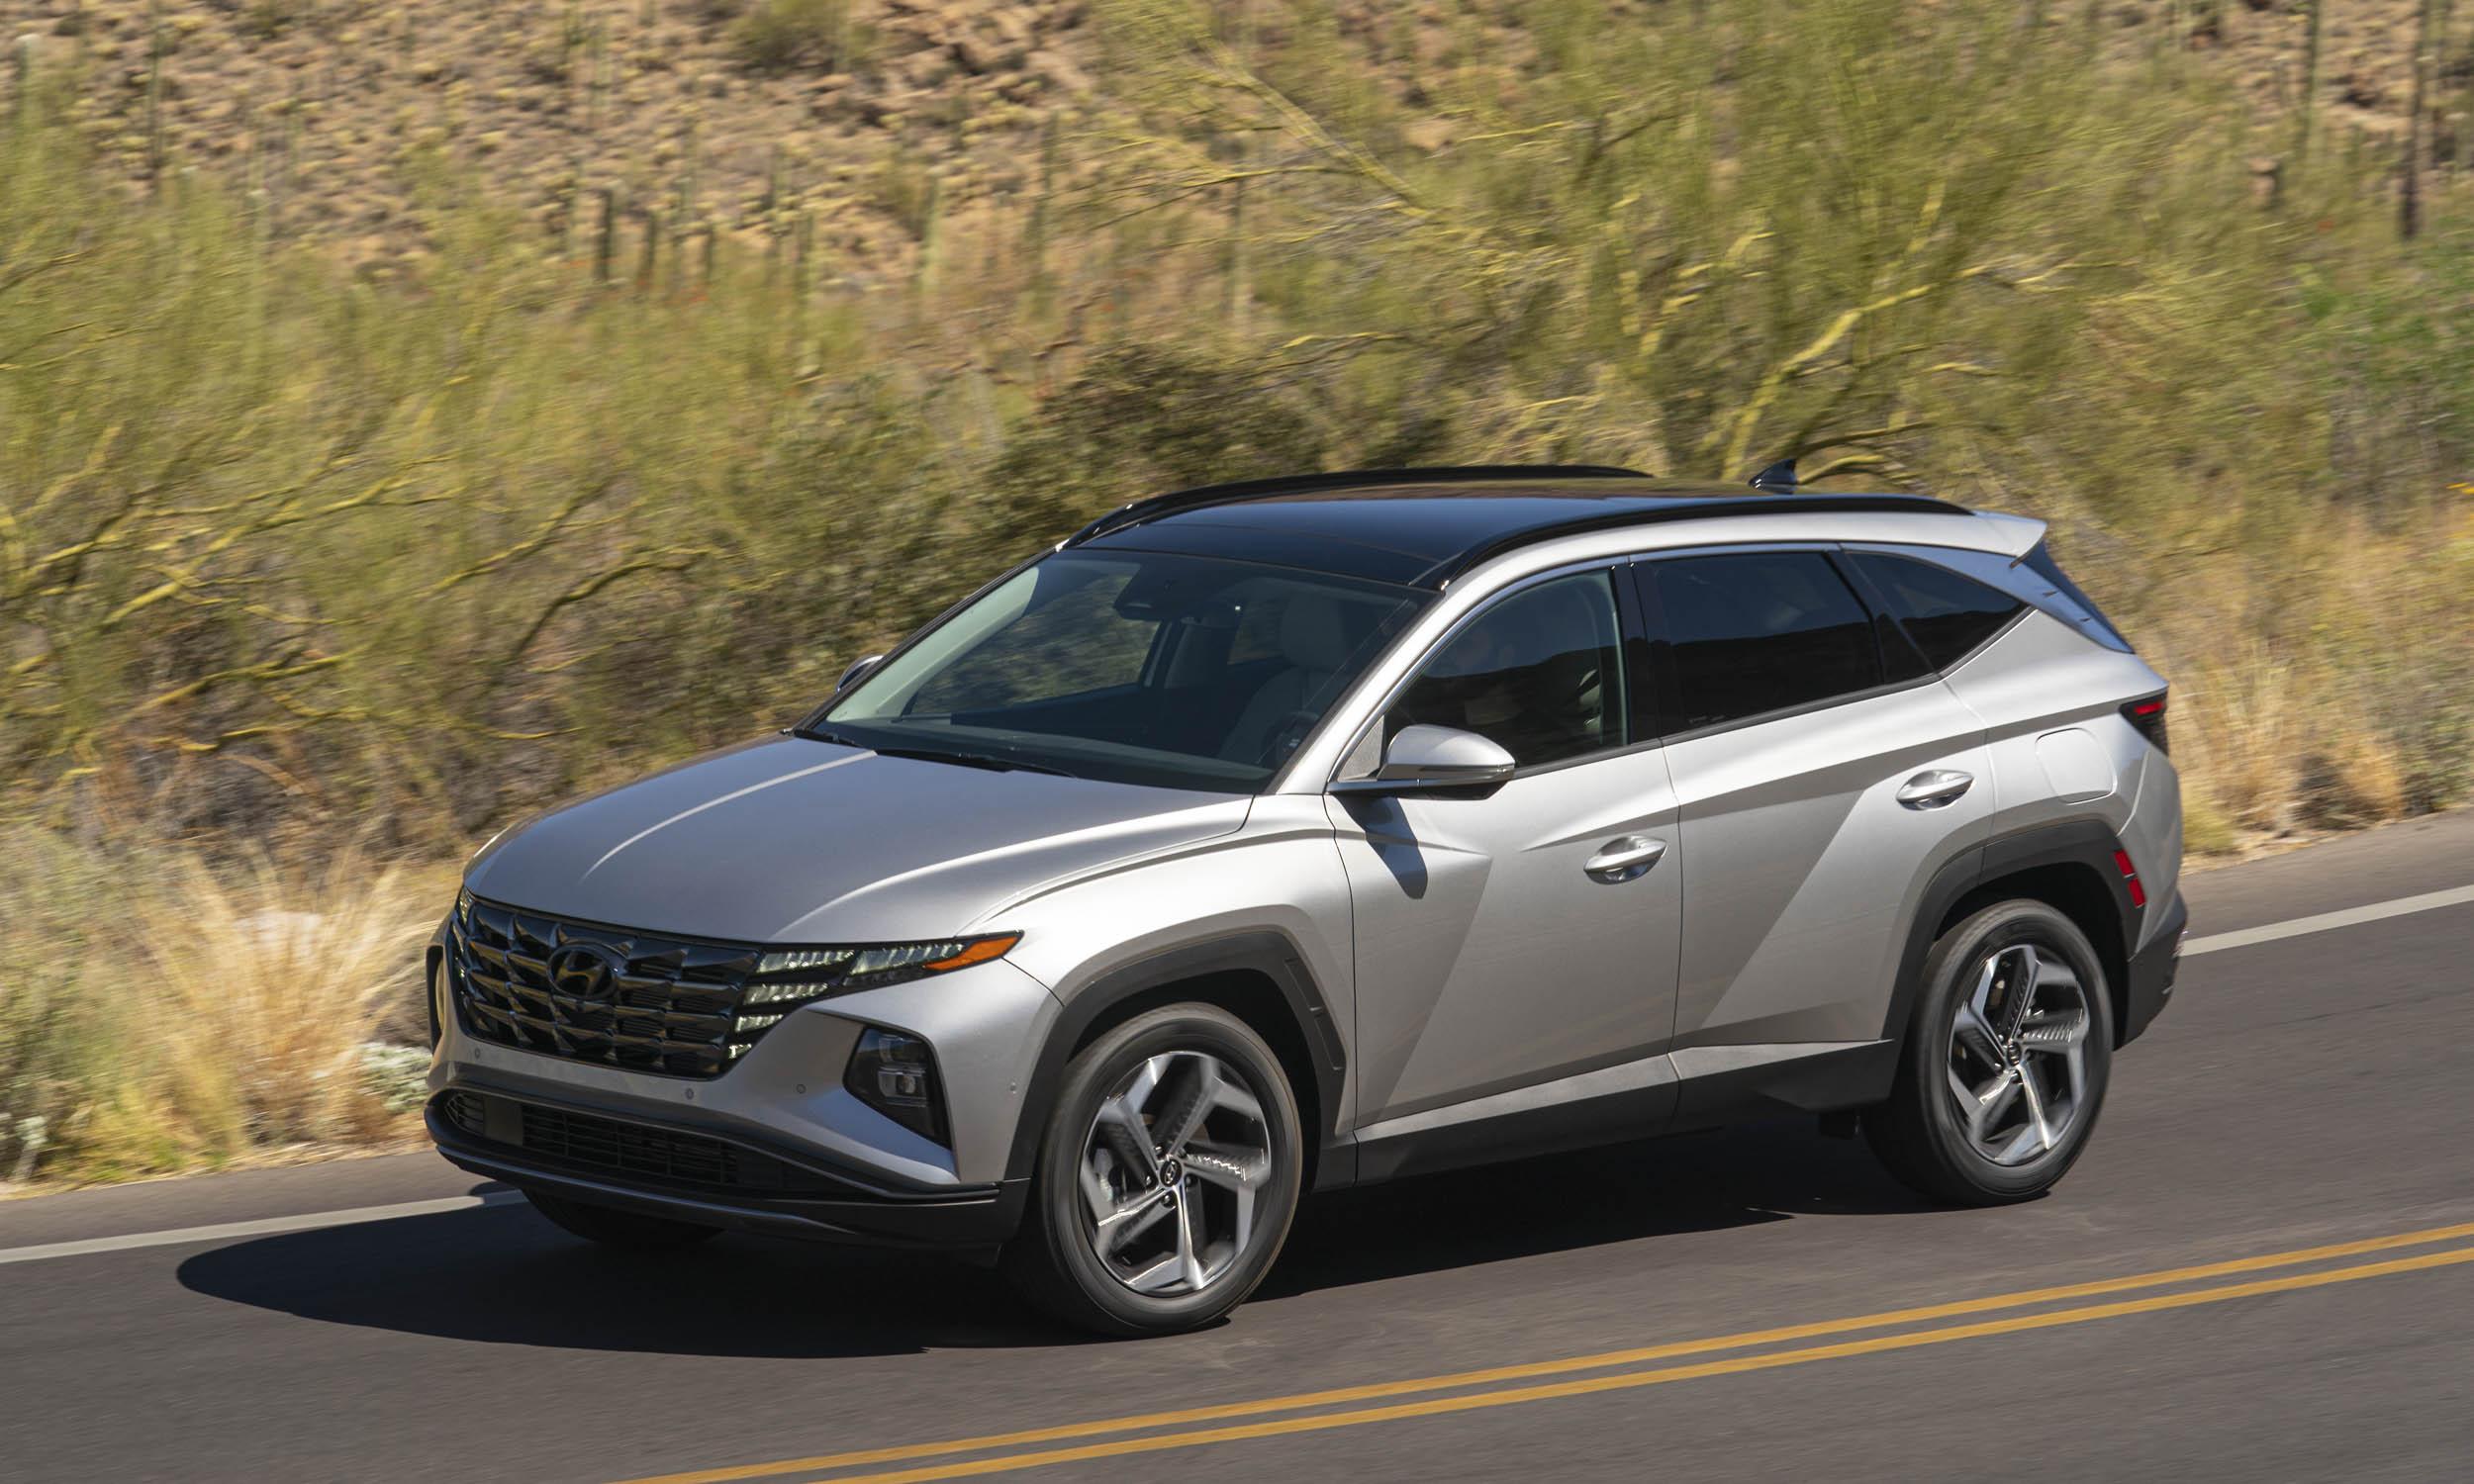 2022 Tucson Limited Engine, 2022 Hyundai Tucson Hybrid Review Autonxt